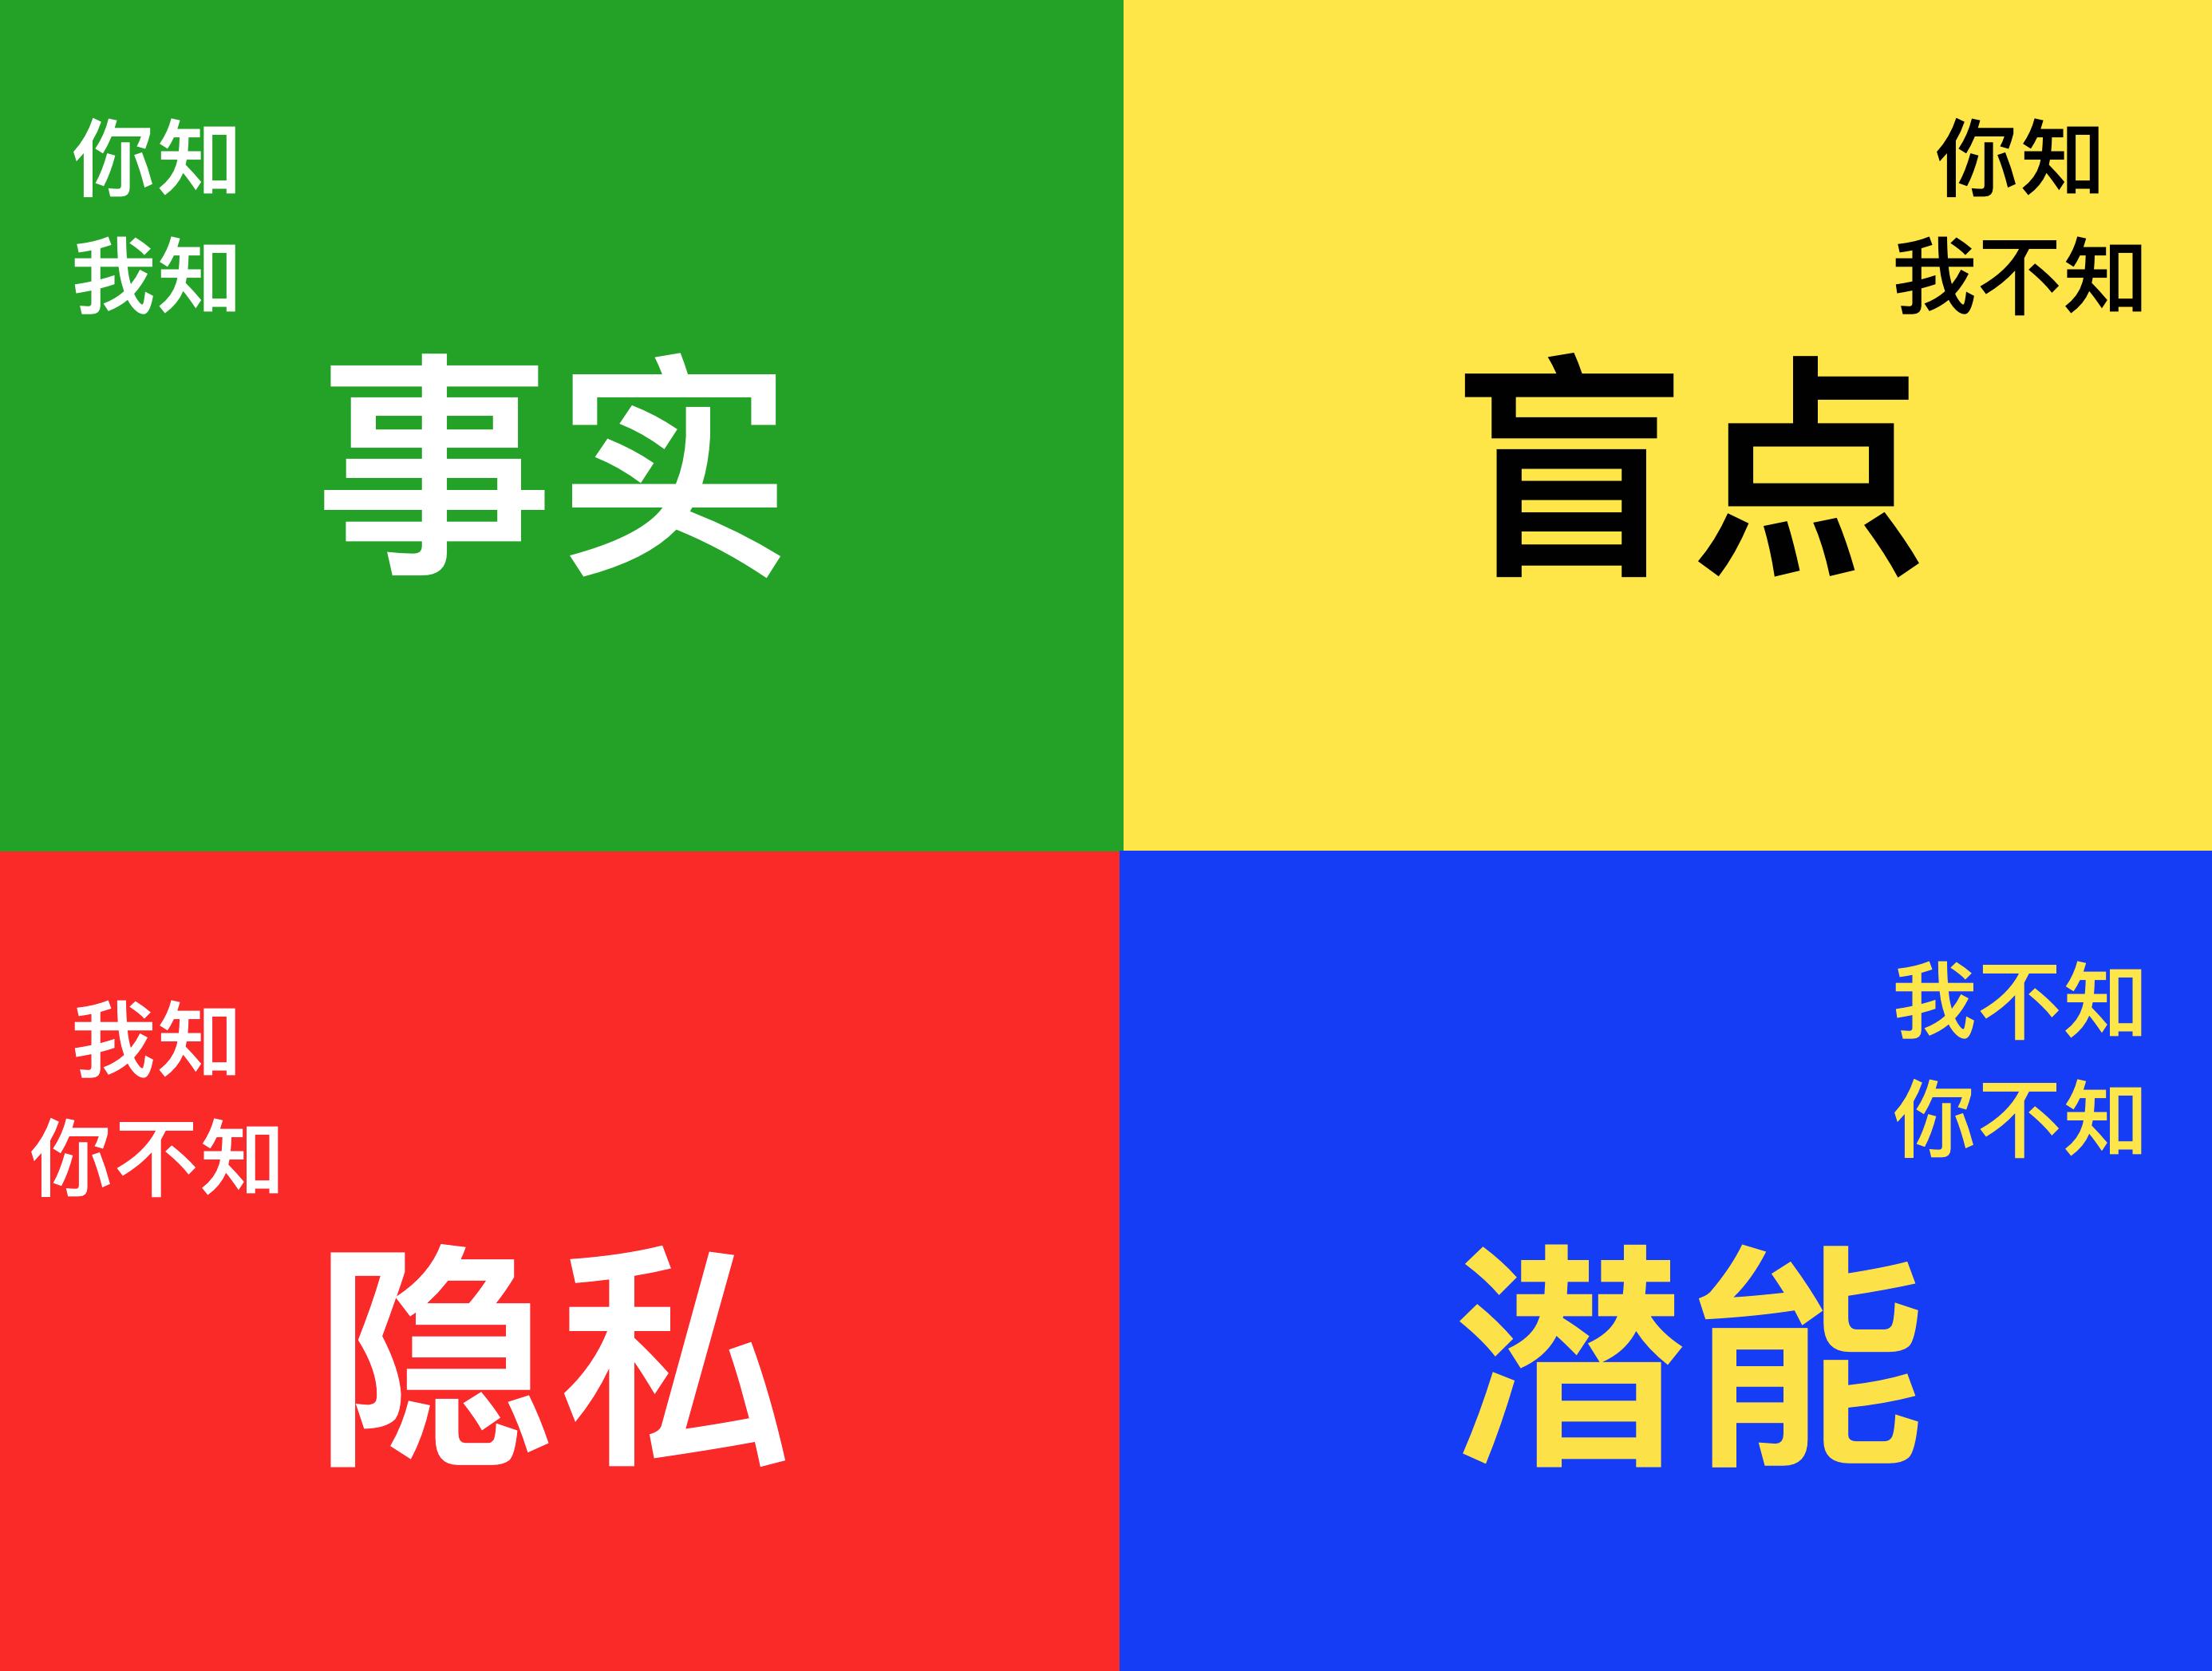 20180513_人生四维.png